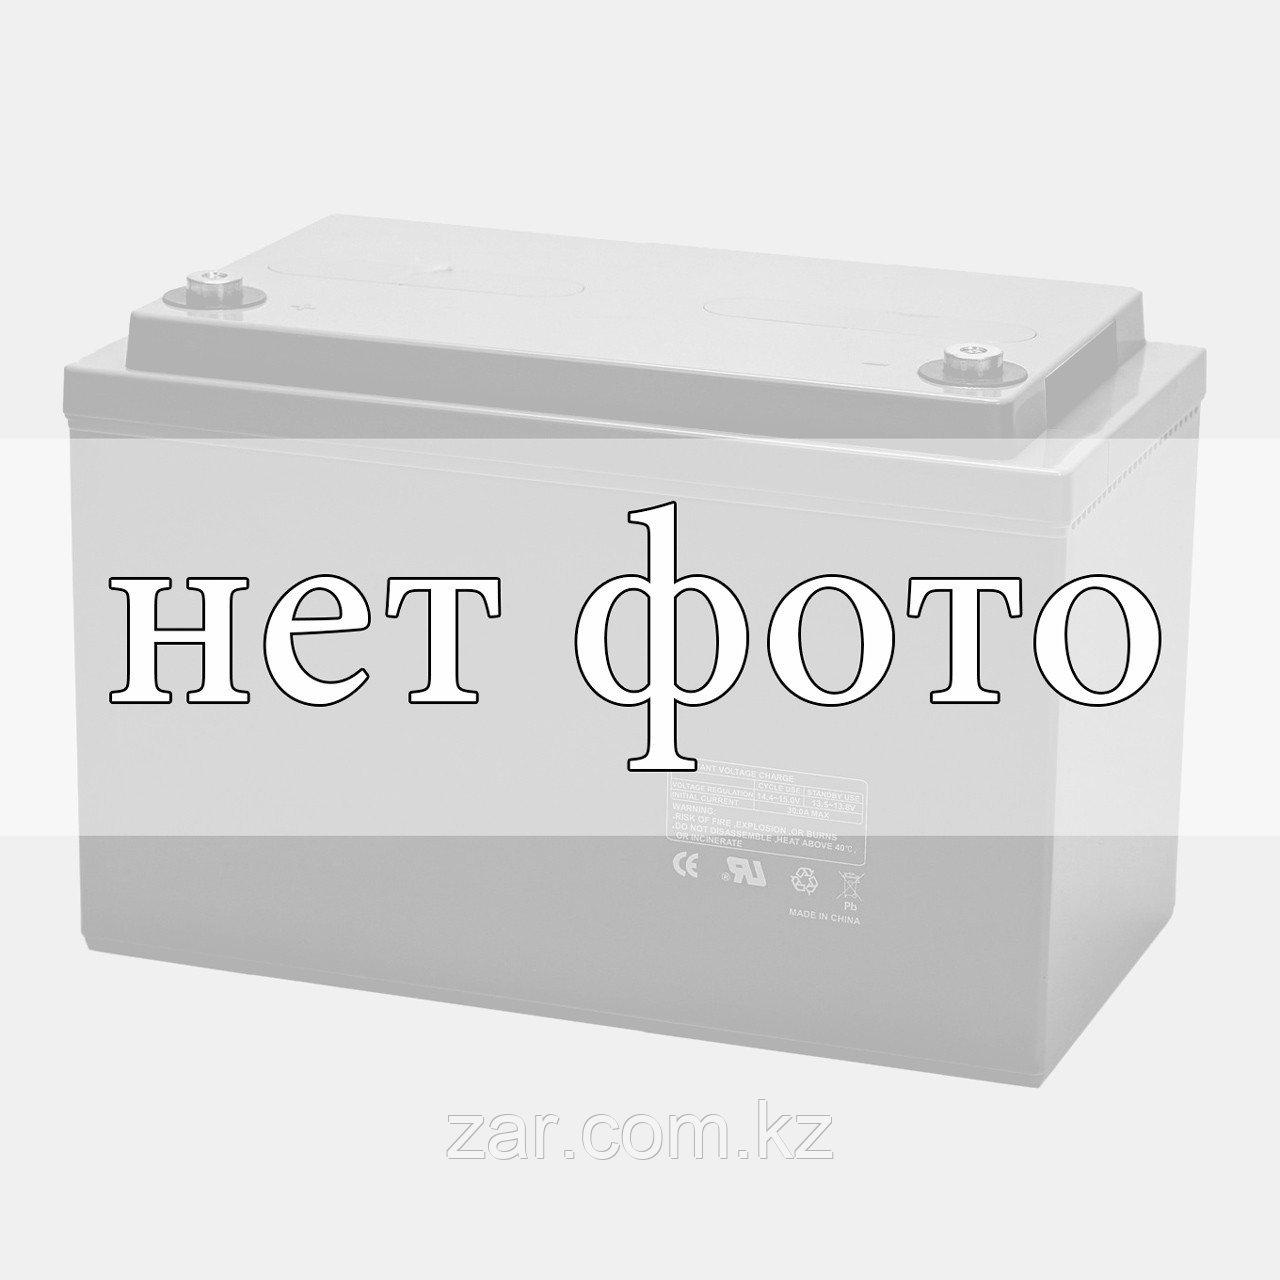 Аккумулятор SSP12-18(12В, 18Ач)